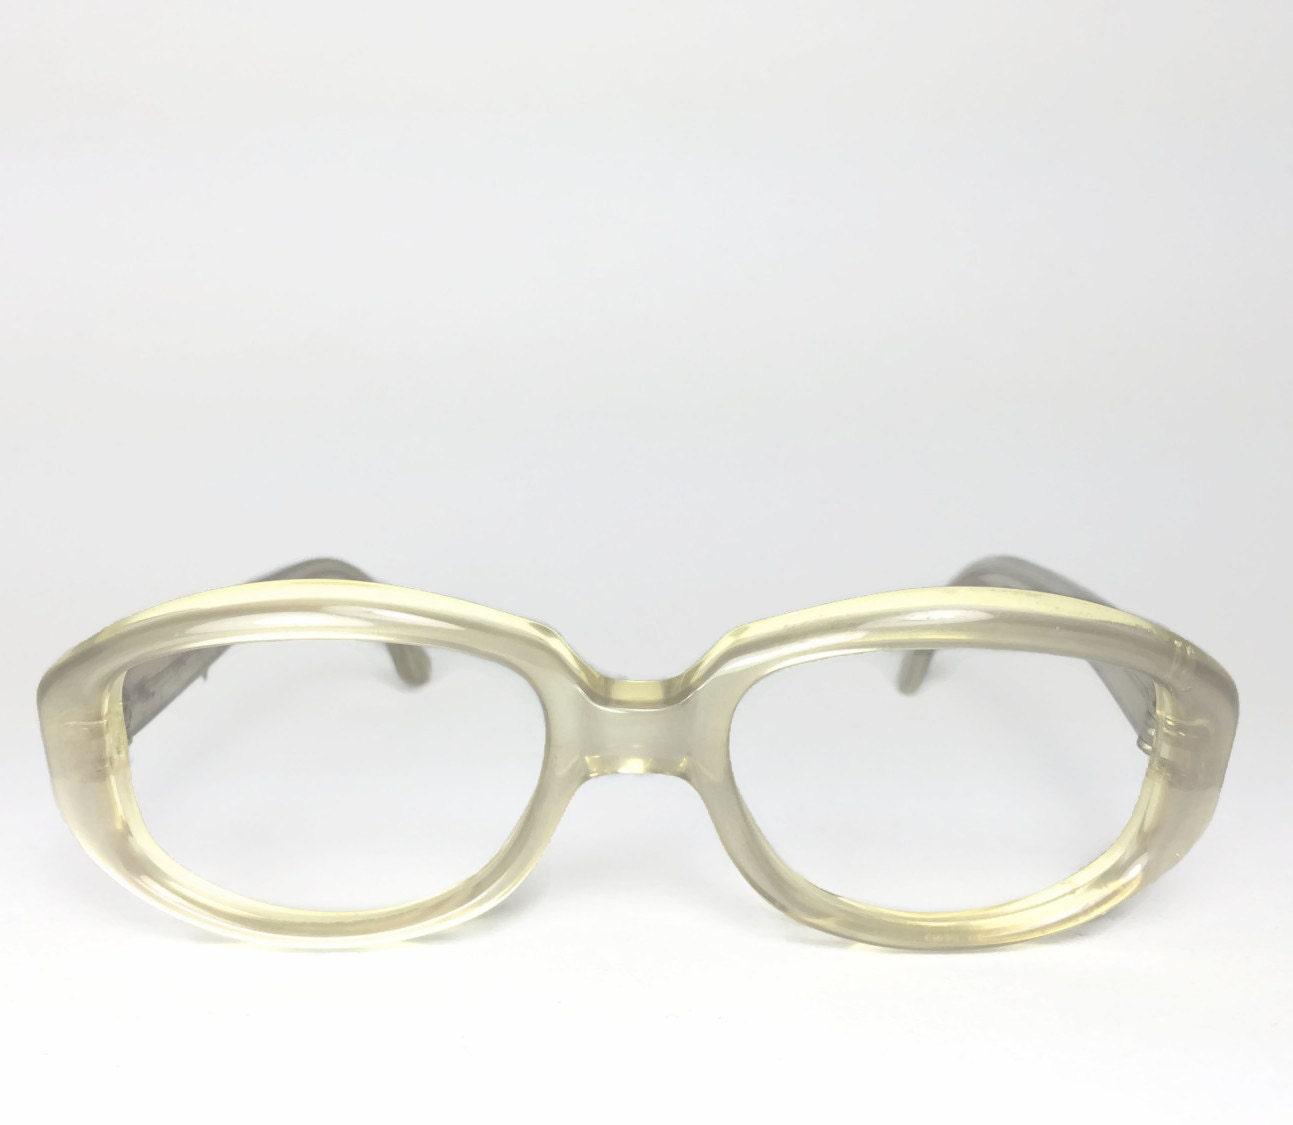 Vintage 60s Eyeglasses   1960s Petite Round Clear Pearl White ...